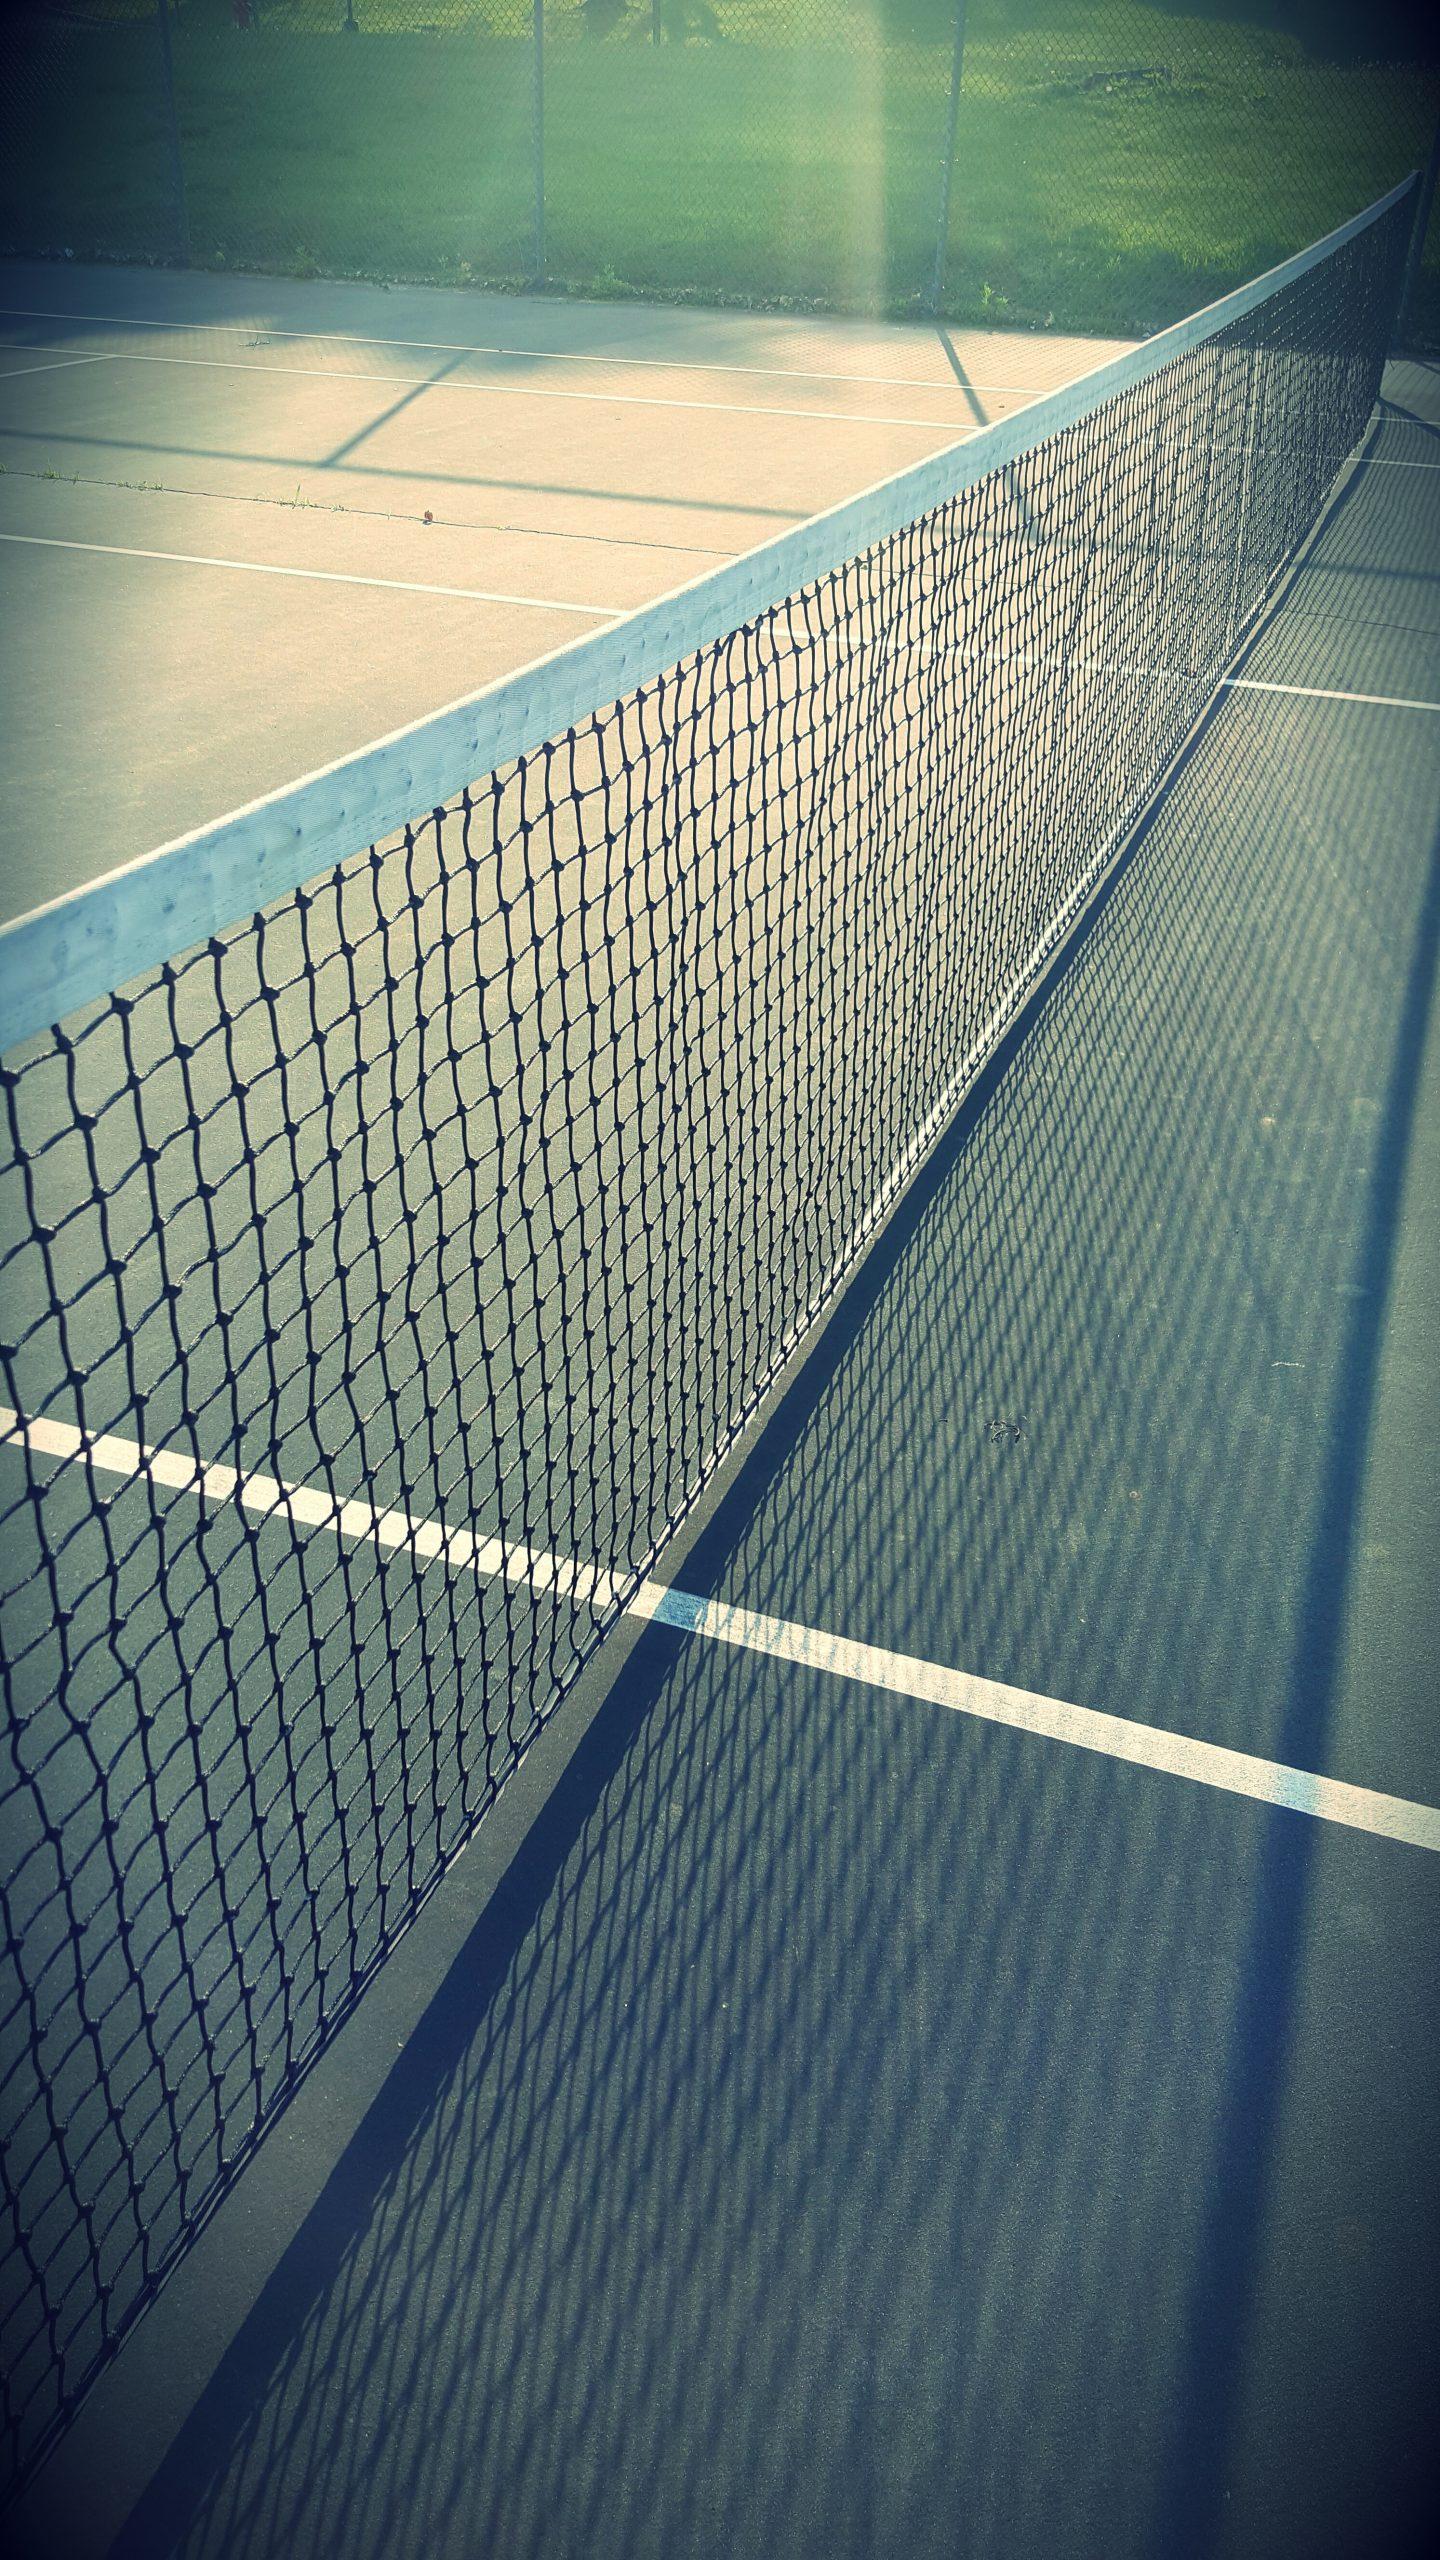 2nd Avenue Beachside Apartments tennis court